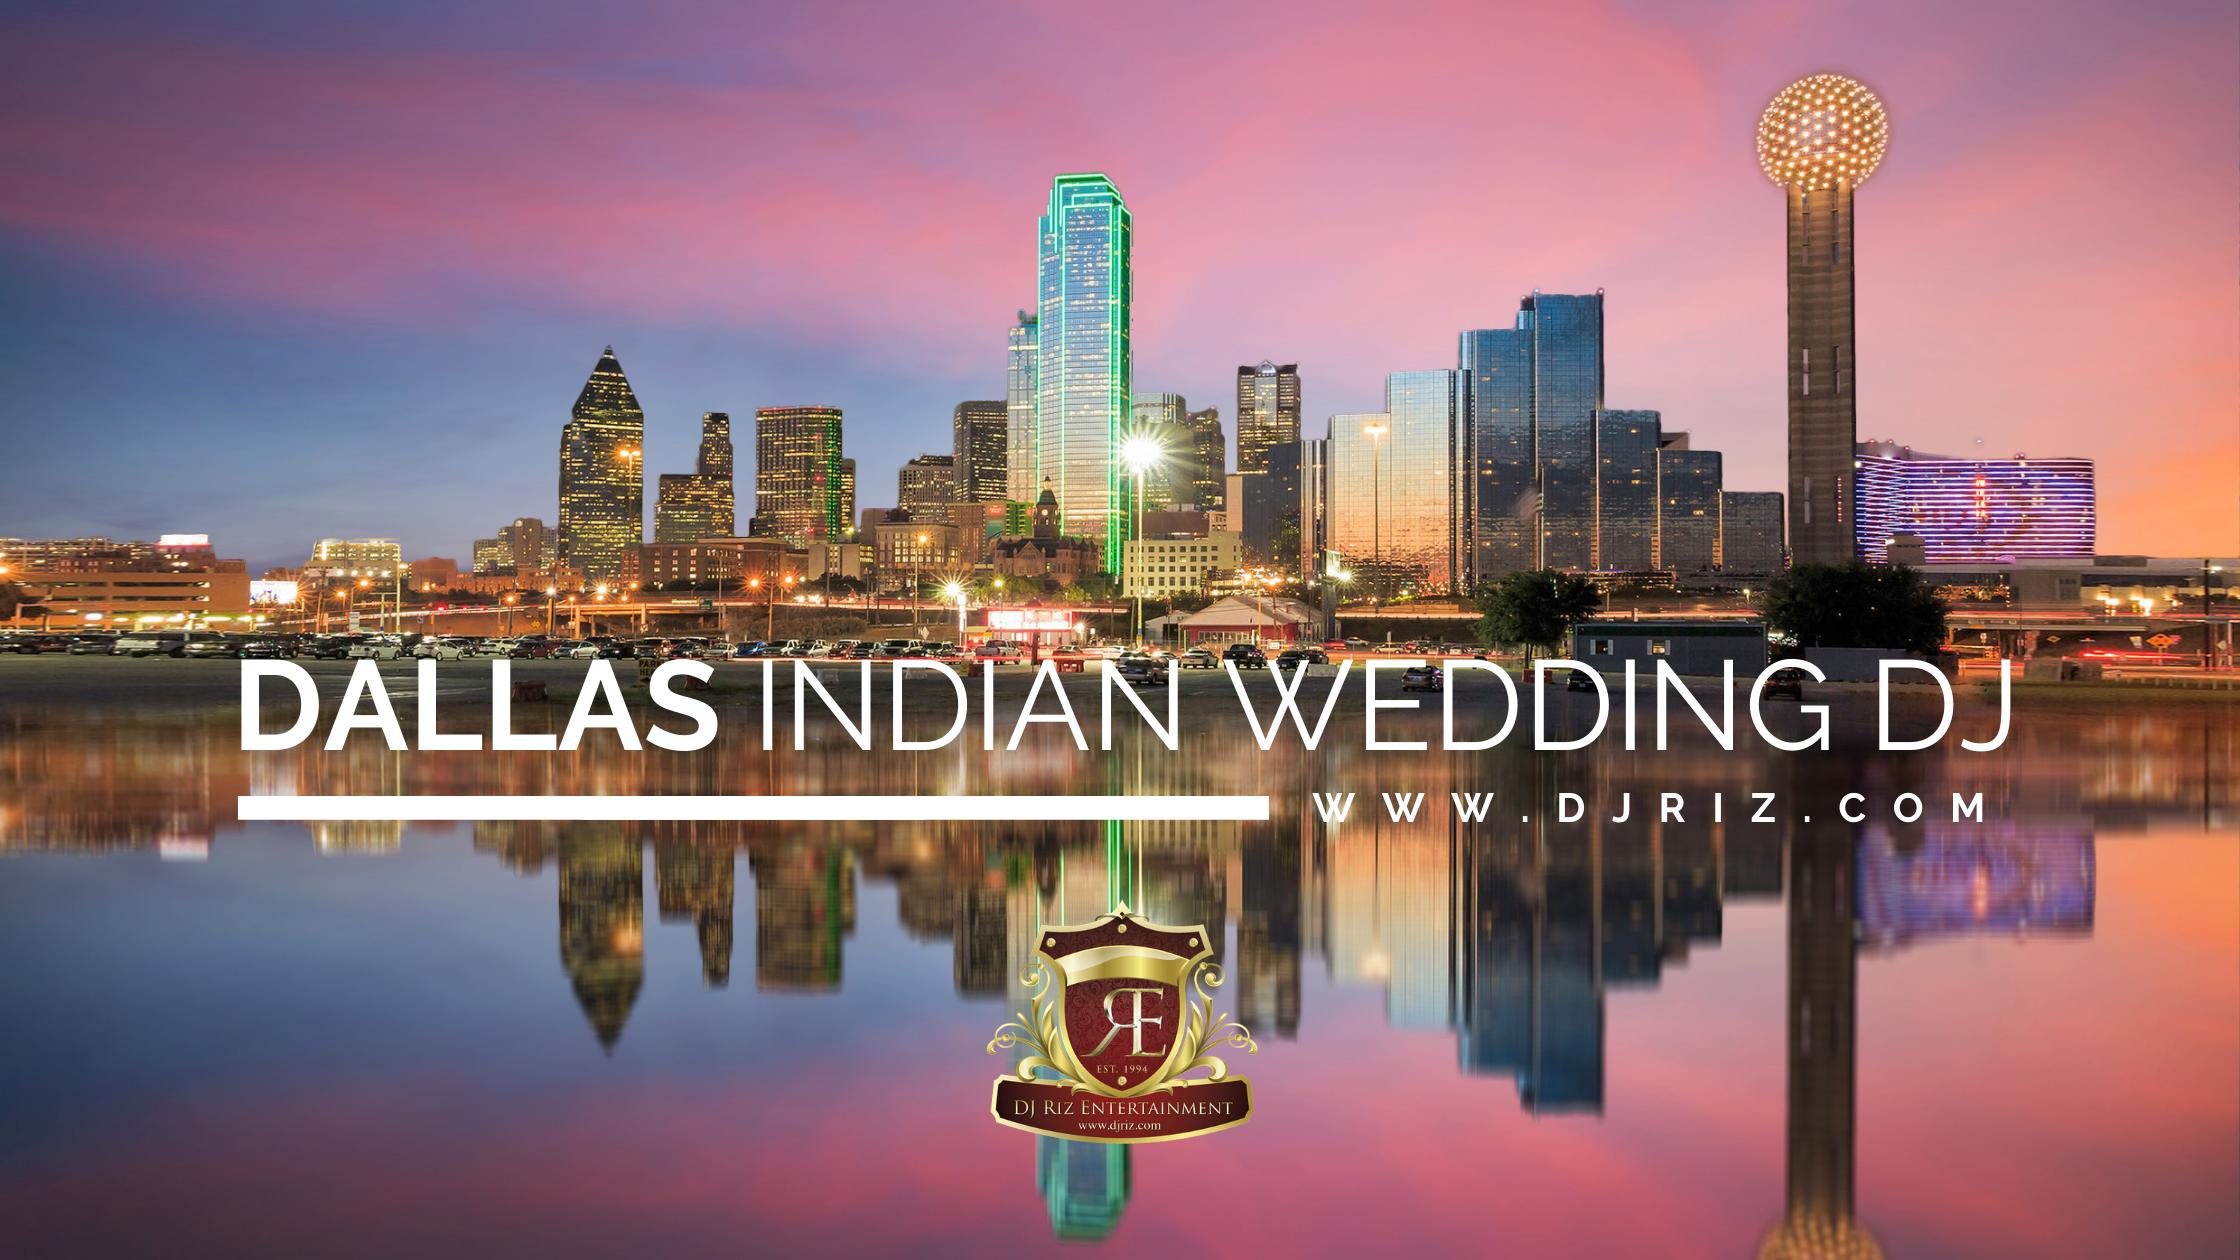 Dallas Indian Wedding DJ